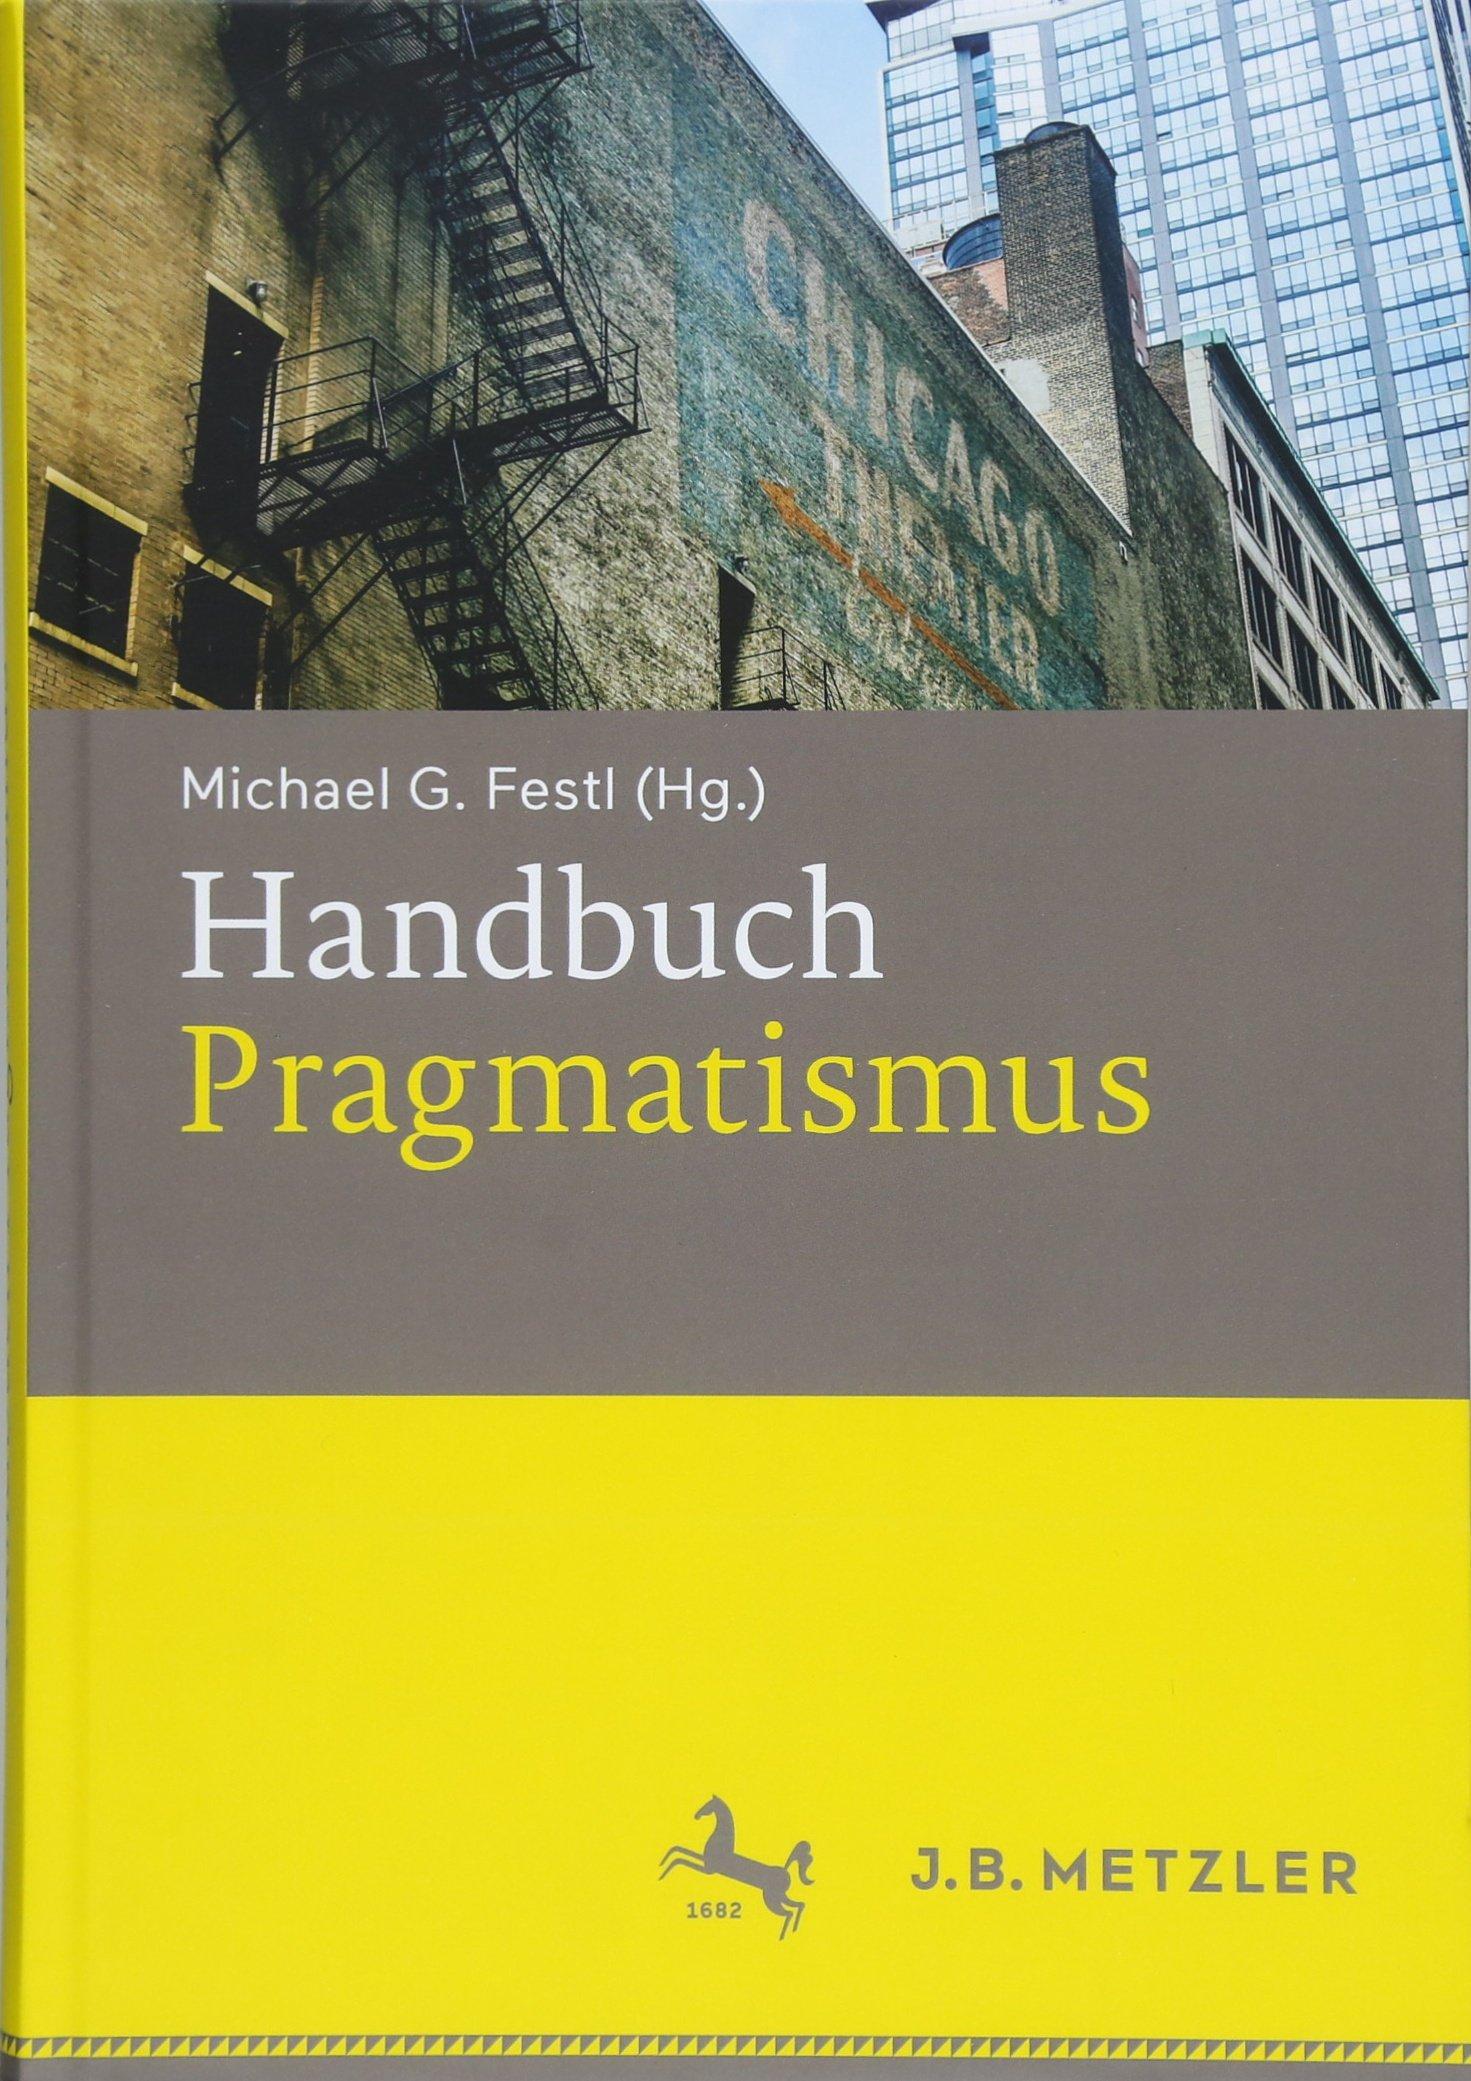 Handbuch Pragmatismus